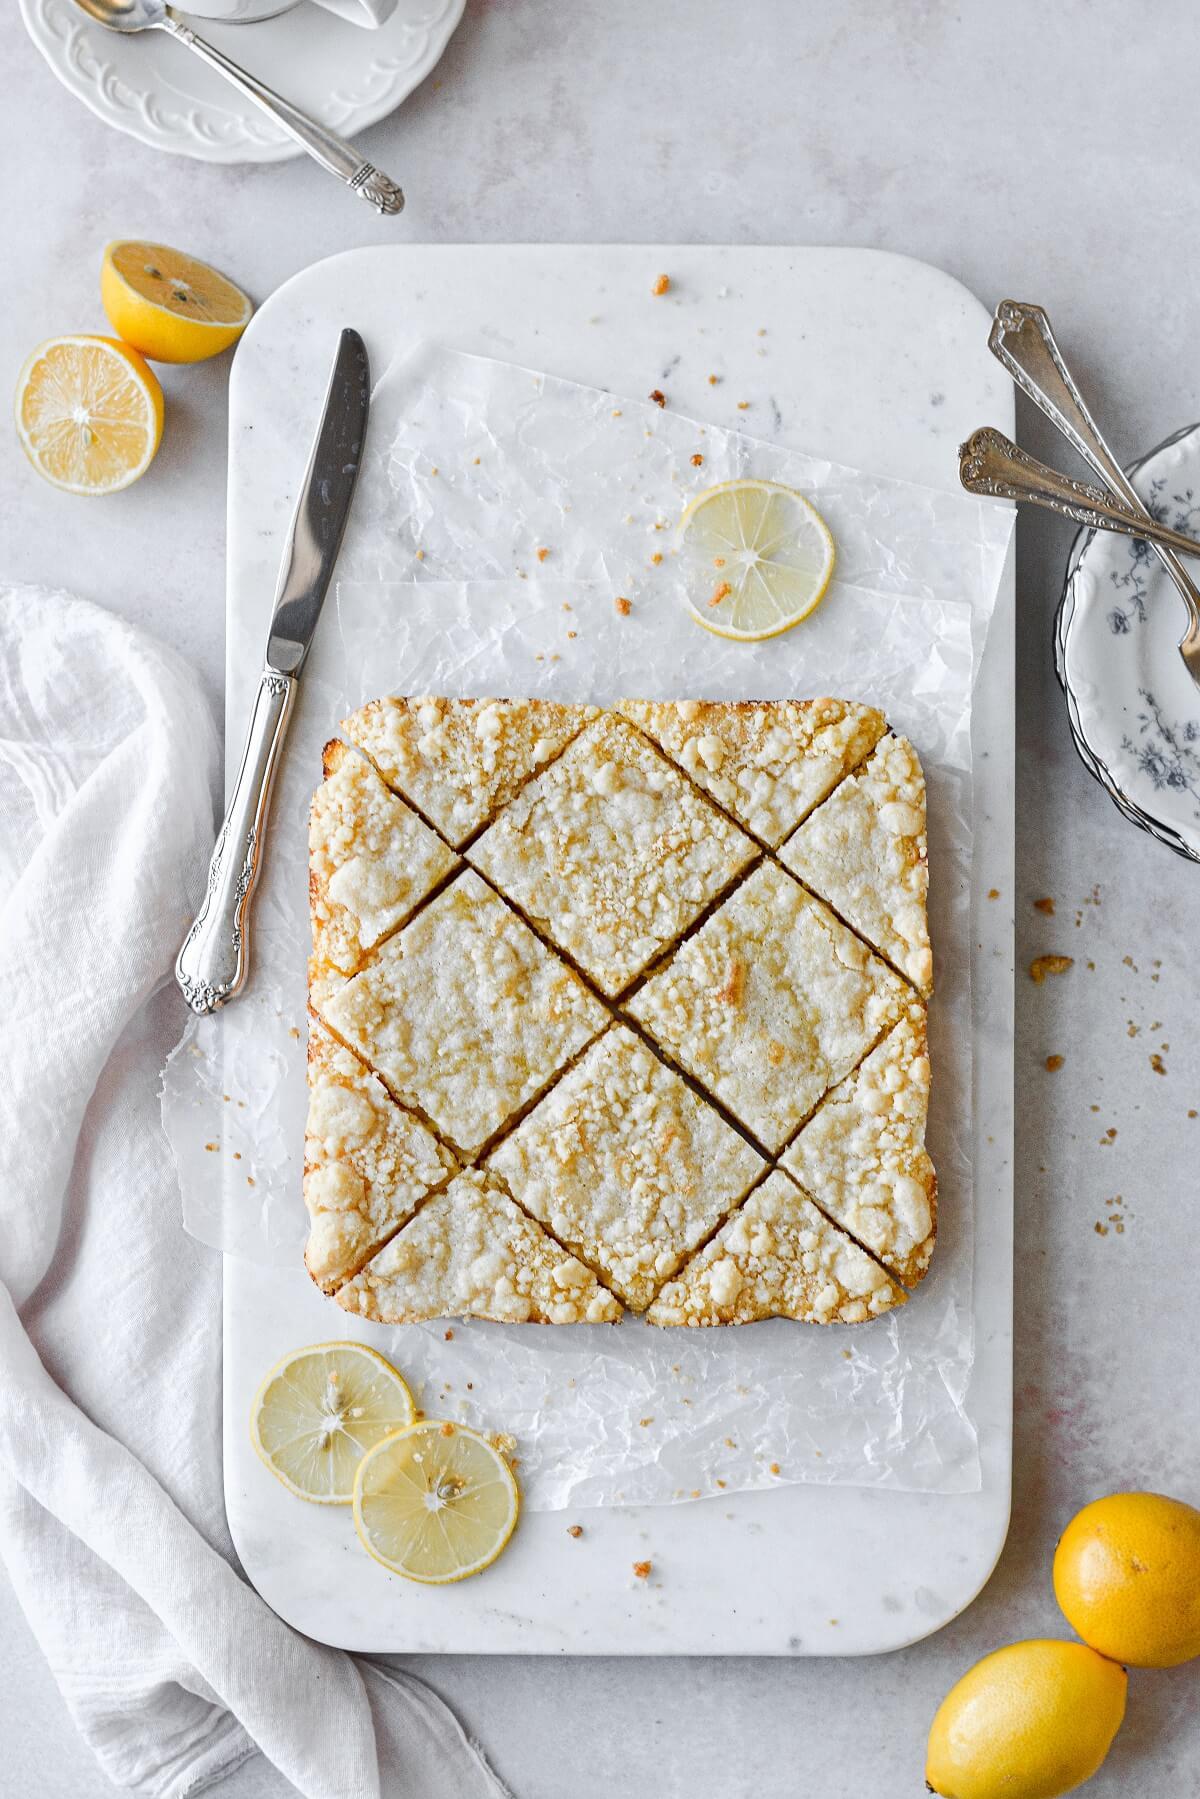 Lemon crumb bars, cut diagonally, on a marble cutting board.